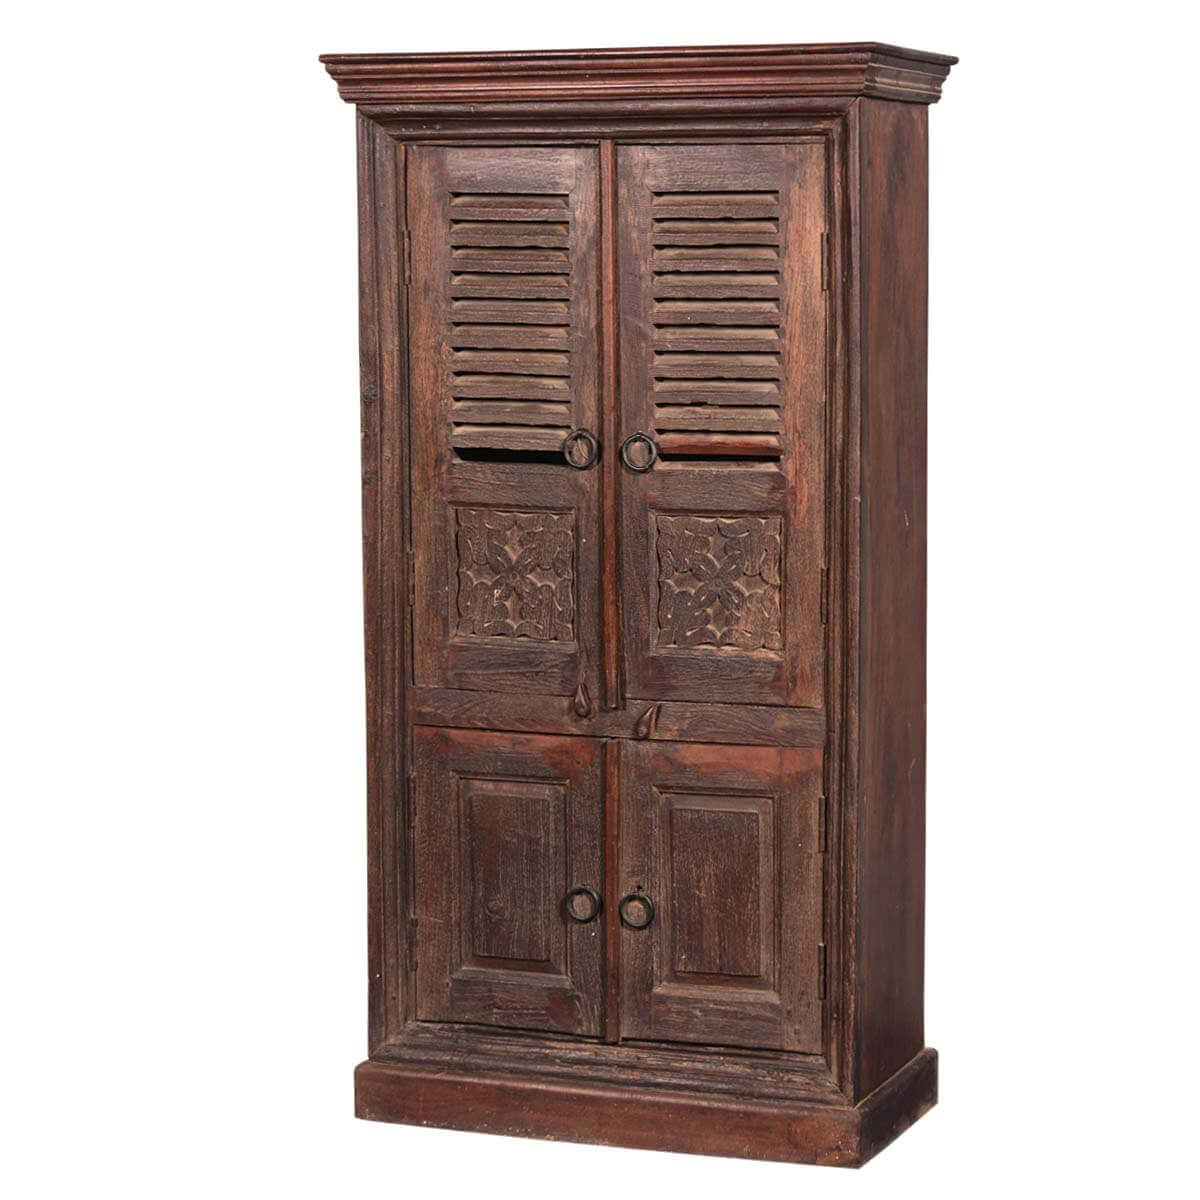 aniwa rustic solid reclaimed wood 4 door tall storage cabinet. Black Bedroom Furniture Sets. Home Design Ideas